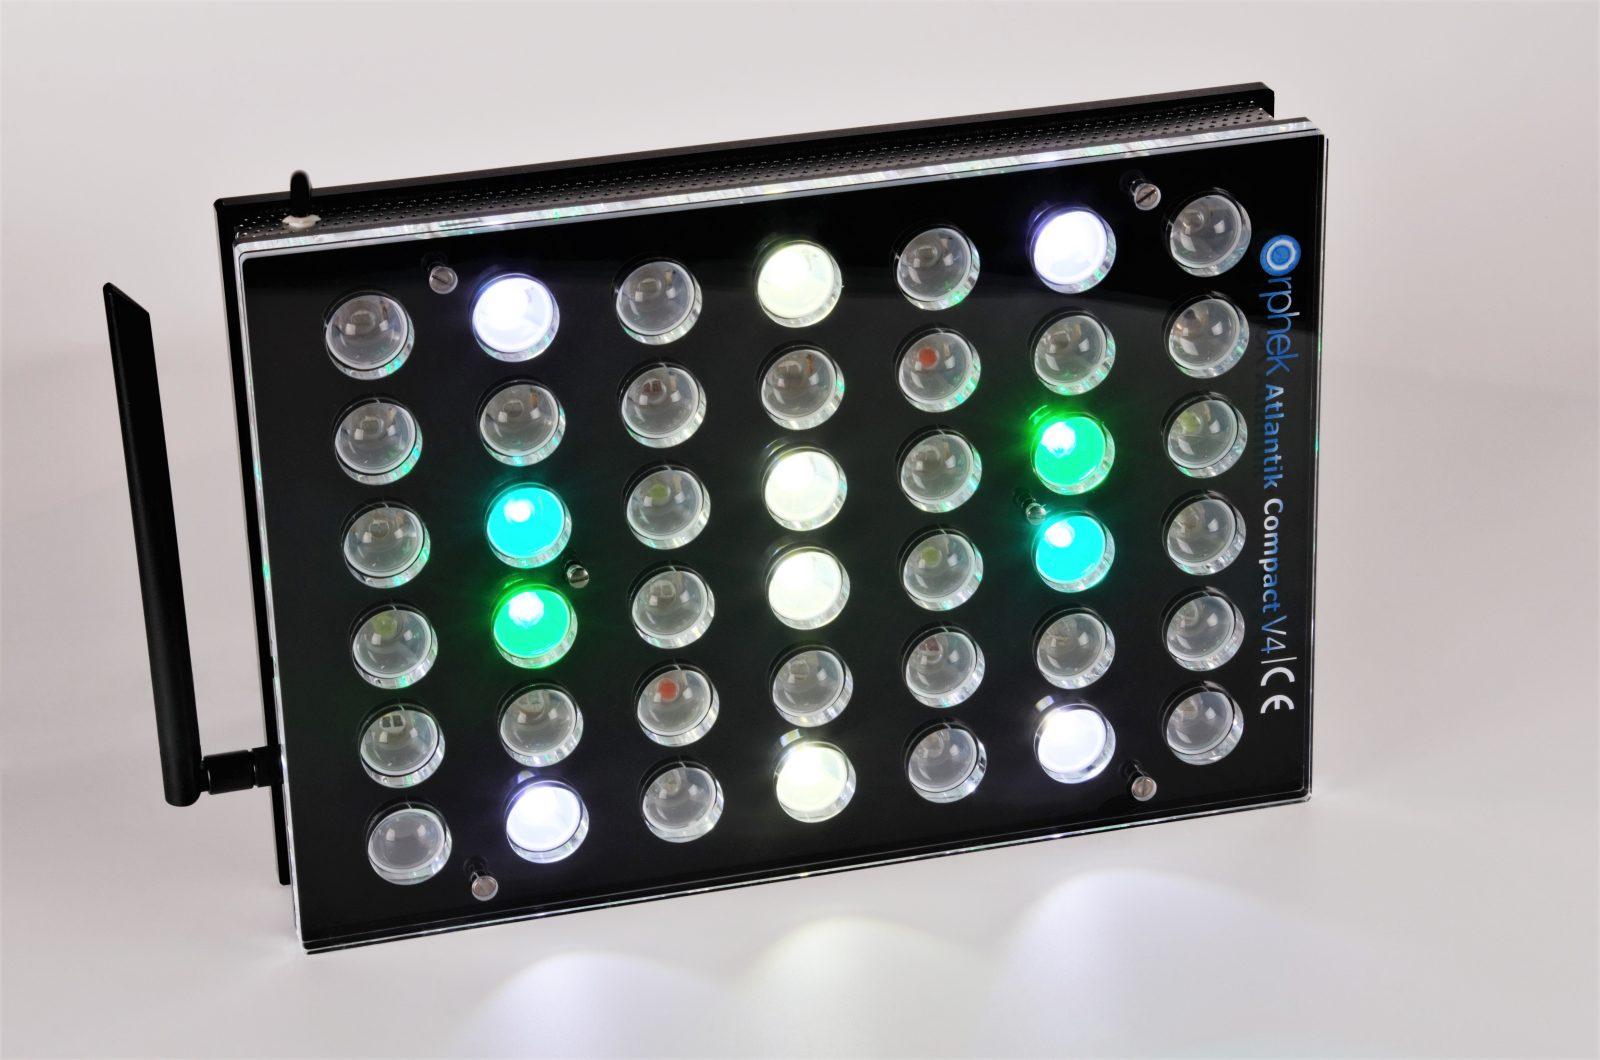 Neue Produkteinführung Atlantik V4 Compact • Orphek Aquarium LED ...